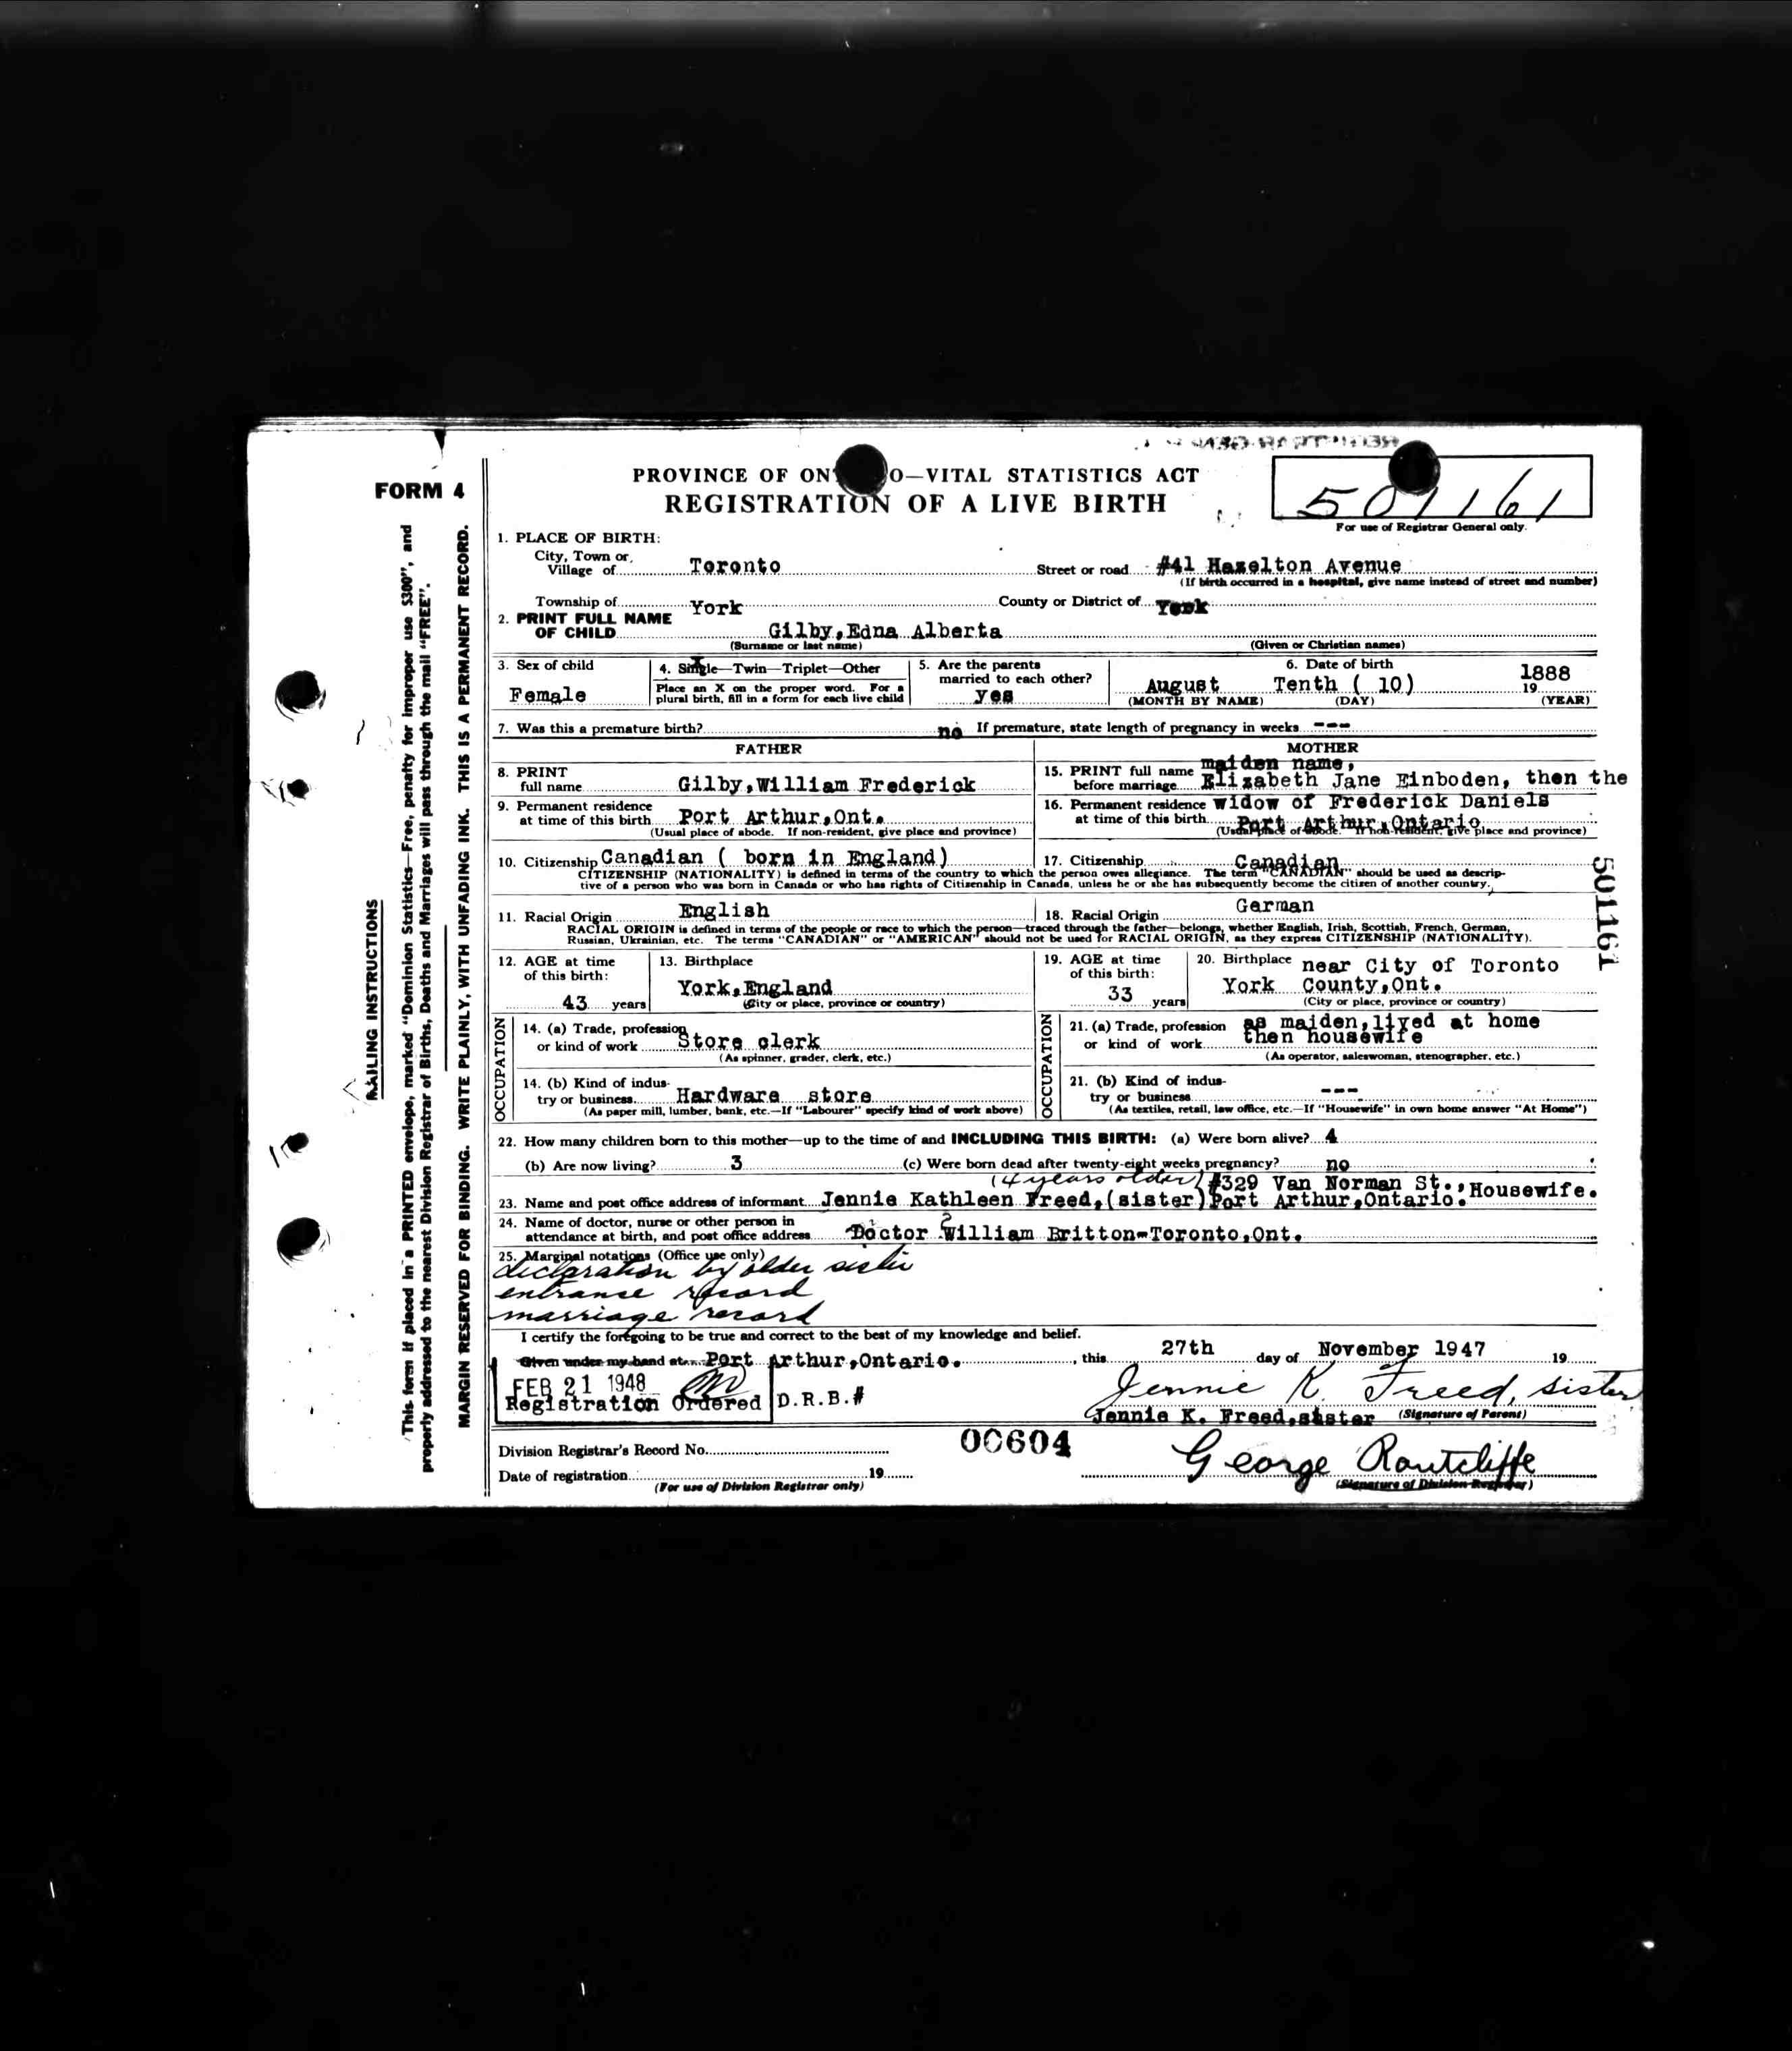 William frederick gilby edna alberta gilbys birth certificate aiddatafo Images